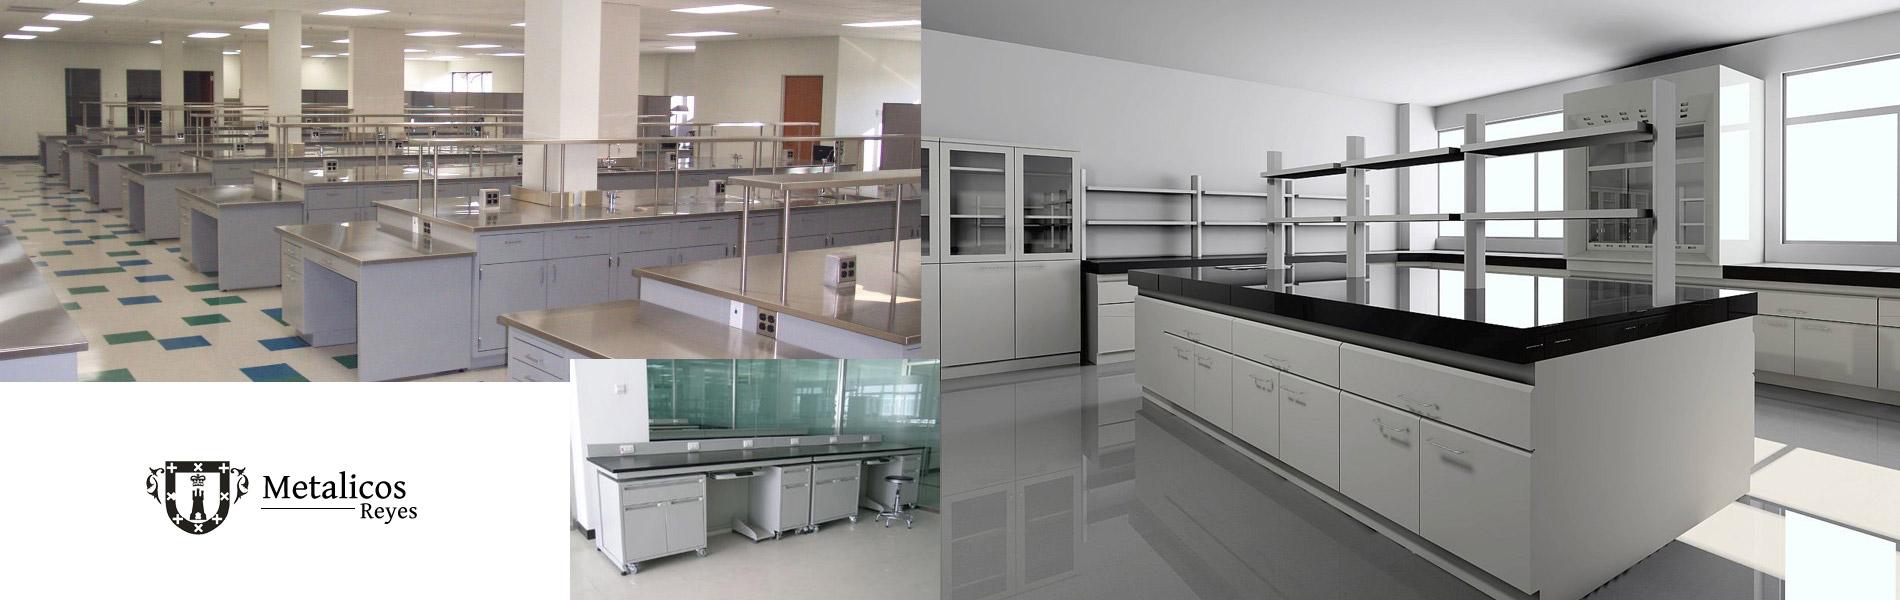 muebles metalicos para laboratorio